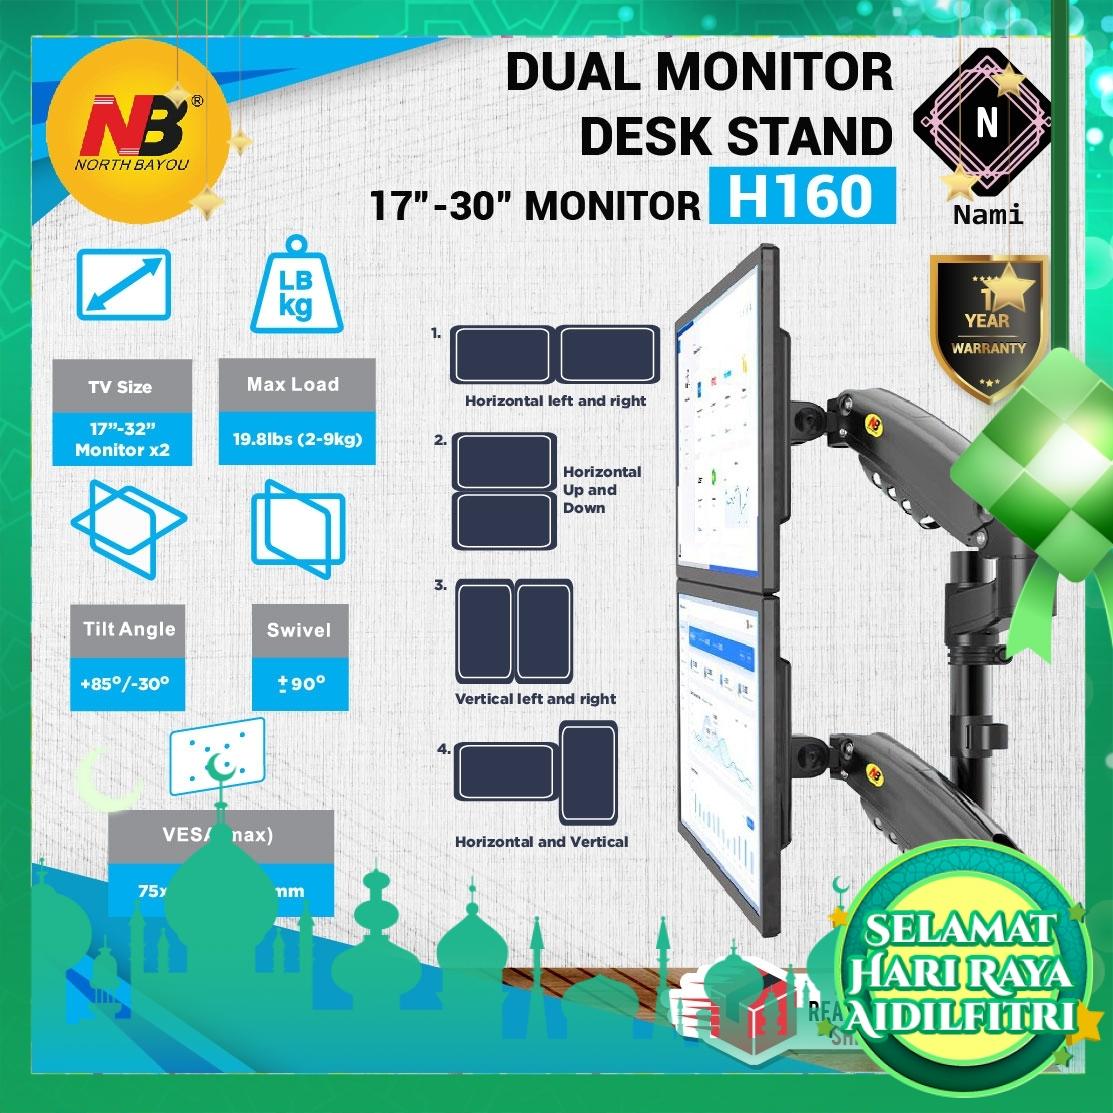 "NB North Bayou H160 Gas Spring Desktop 30"" Dual Monitor Holder Arm Monitor Mount Bracket Load 2-9 kg each Arm"